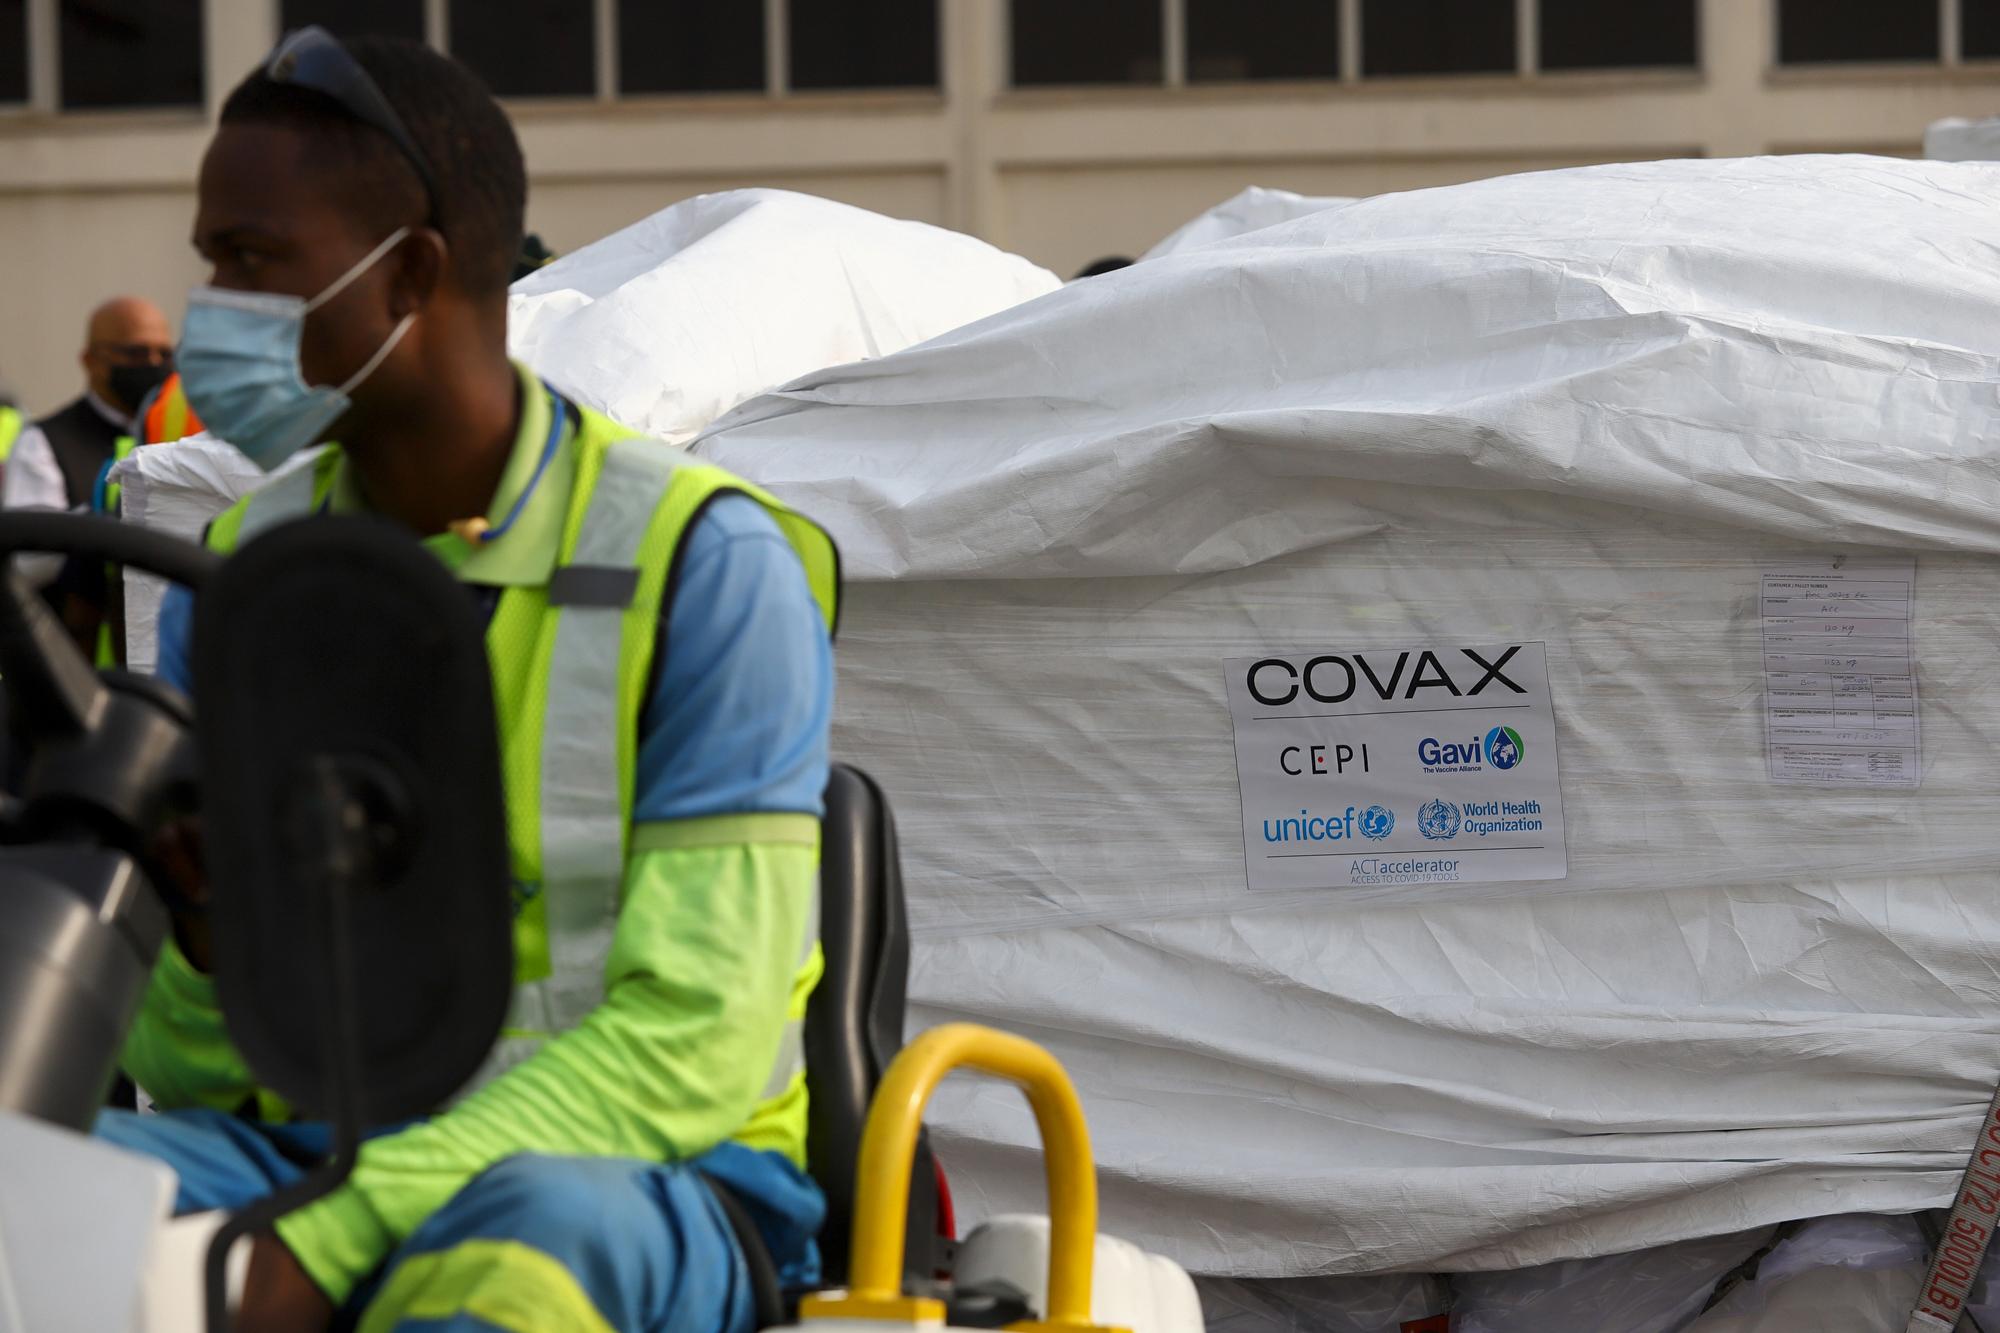 COVAX OBJAVIO PLAN RASPODJELE 237 MILIONA DOZA VAKCINA! BiH će do kraja maja dobiti tek 108.000 doza AstraZeneca vakcine!